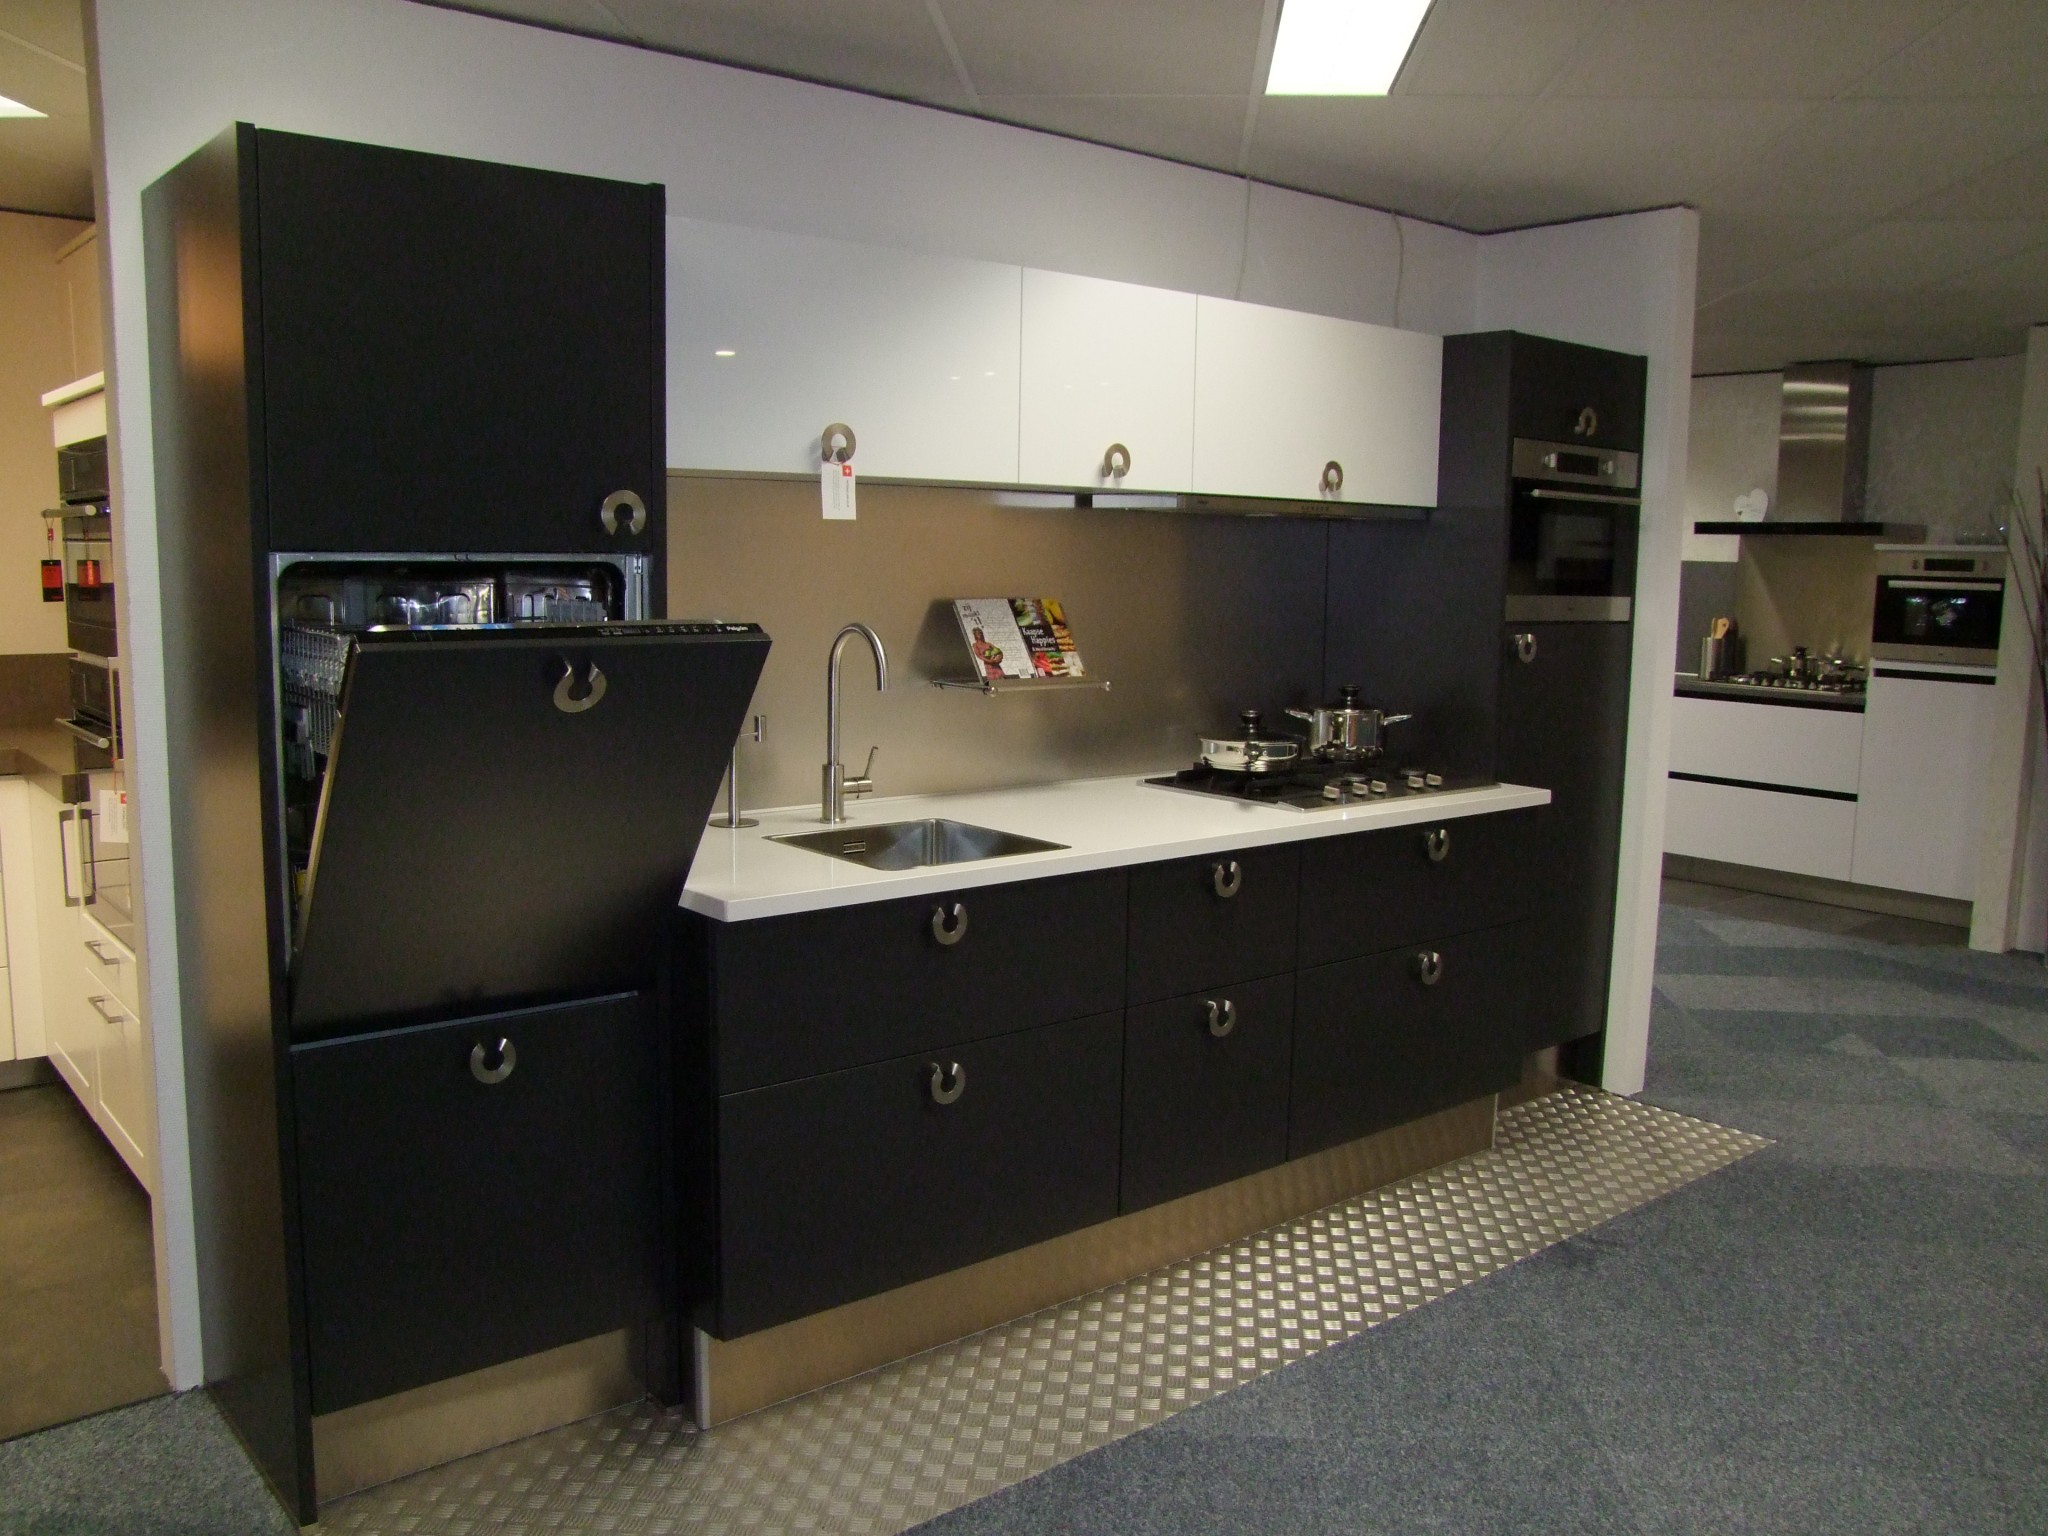 Opruiming Keukens Ikea : Prachtige vancel keuken kremer keukens showroom opruiming